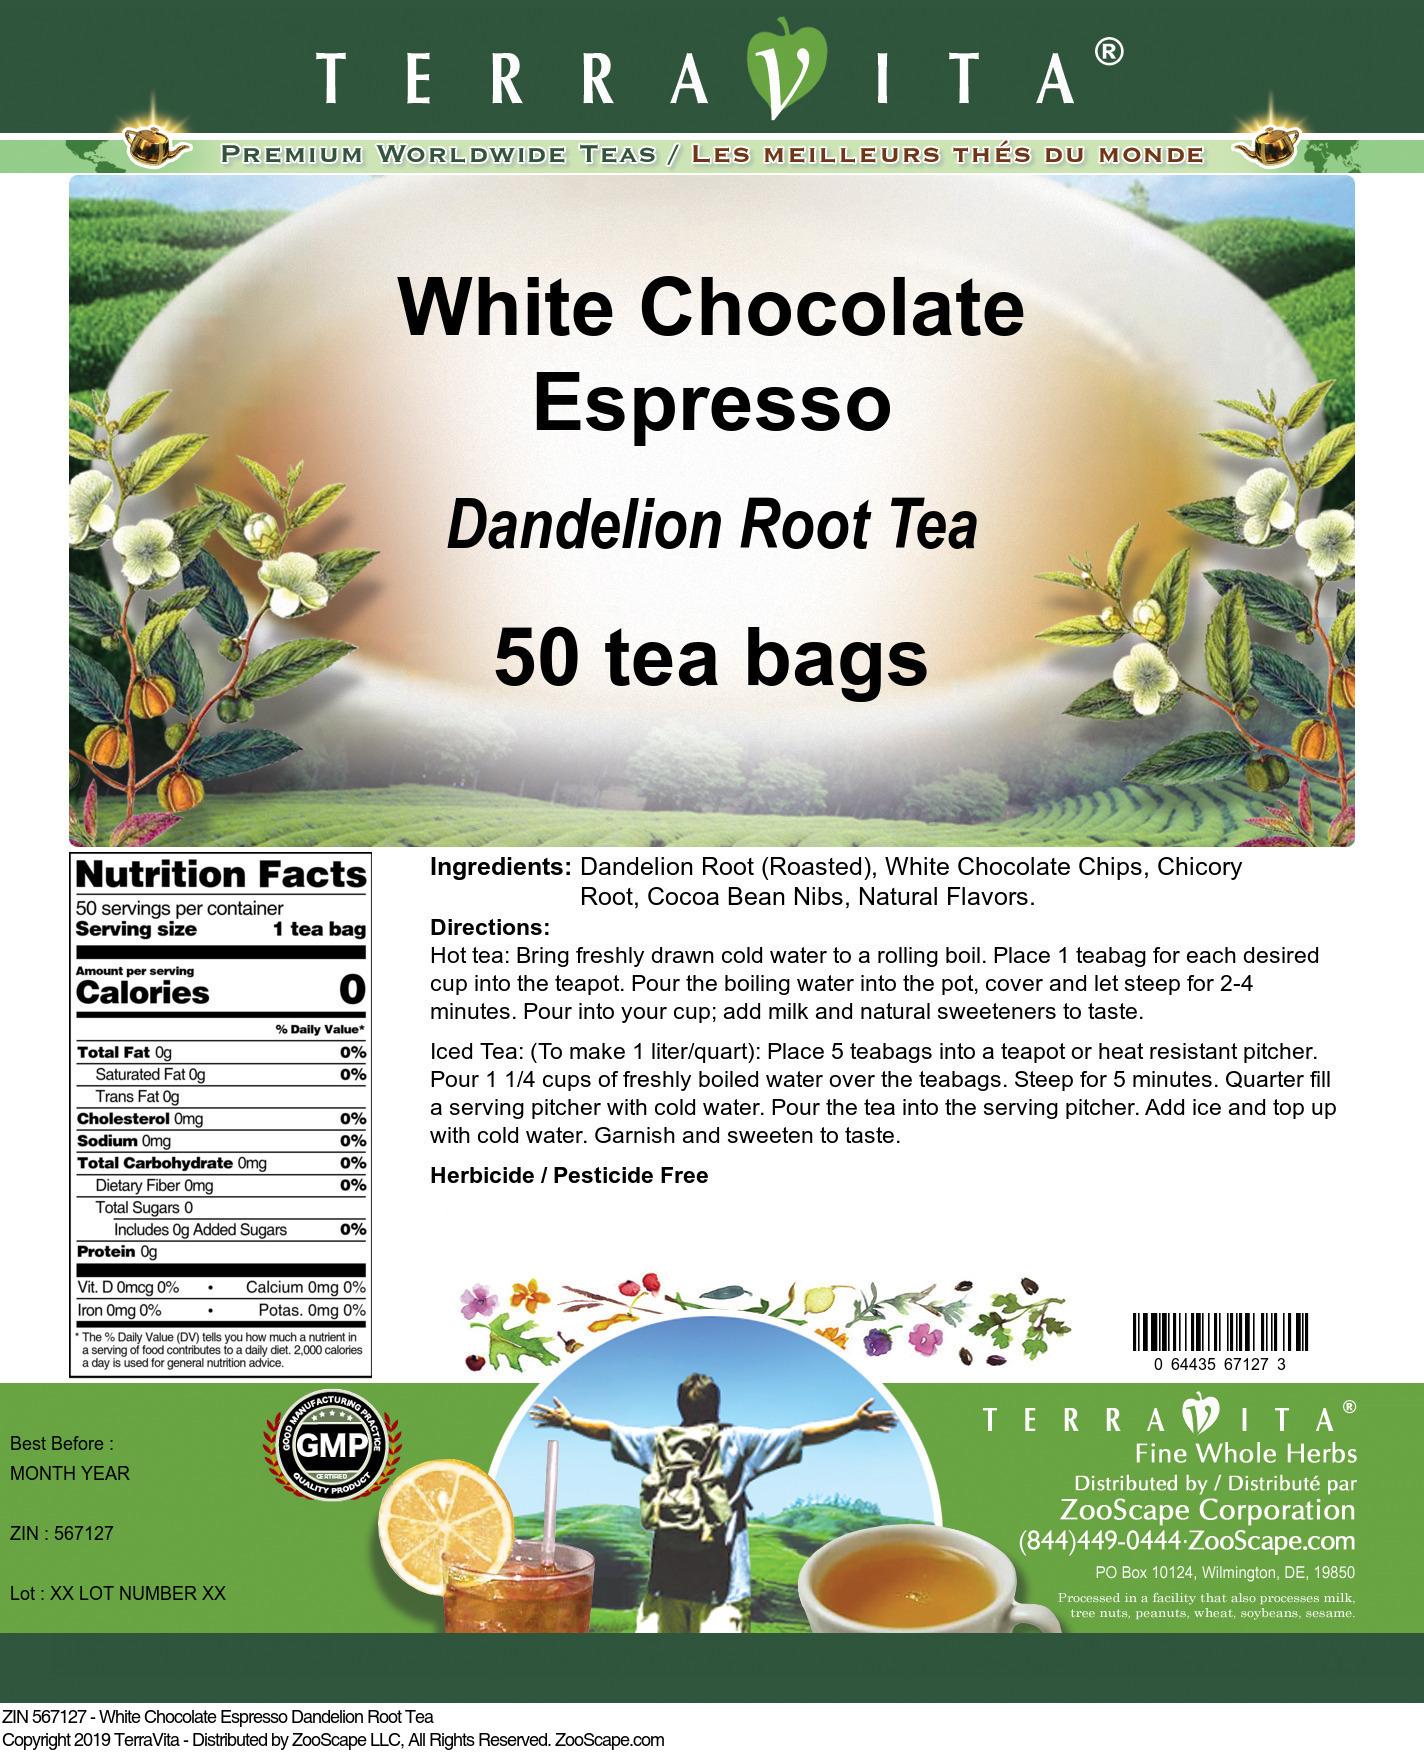 White Chocolate Espresso Dandelion Root Tea